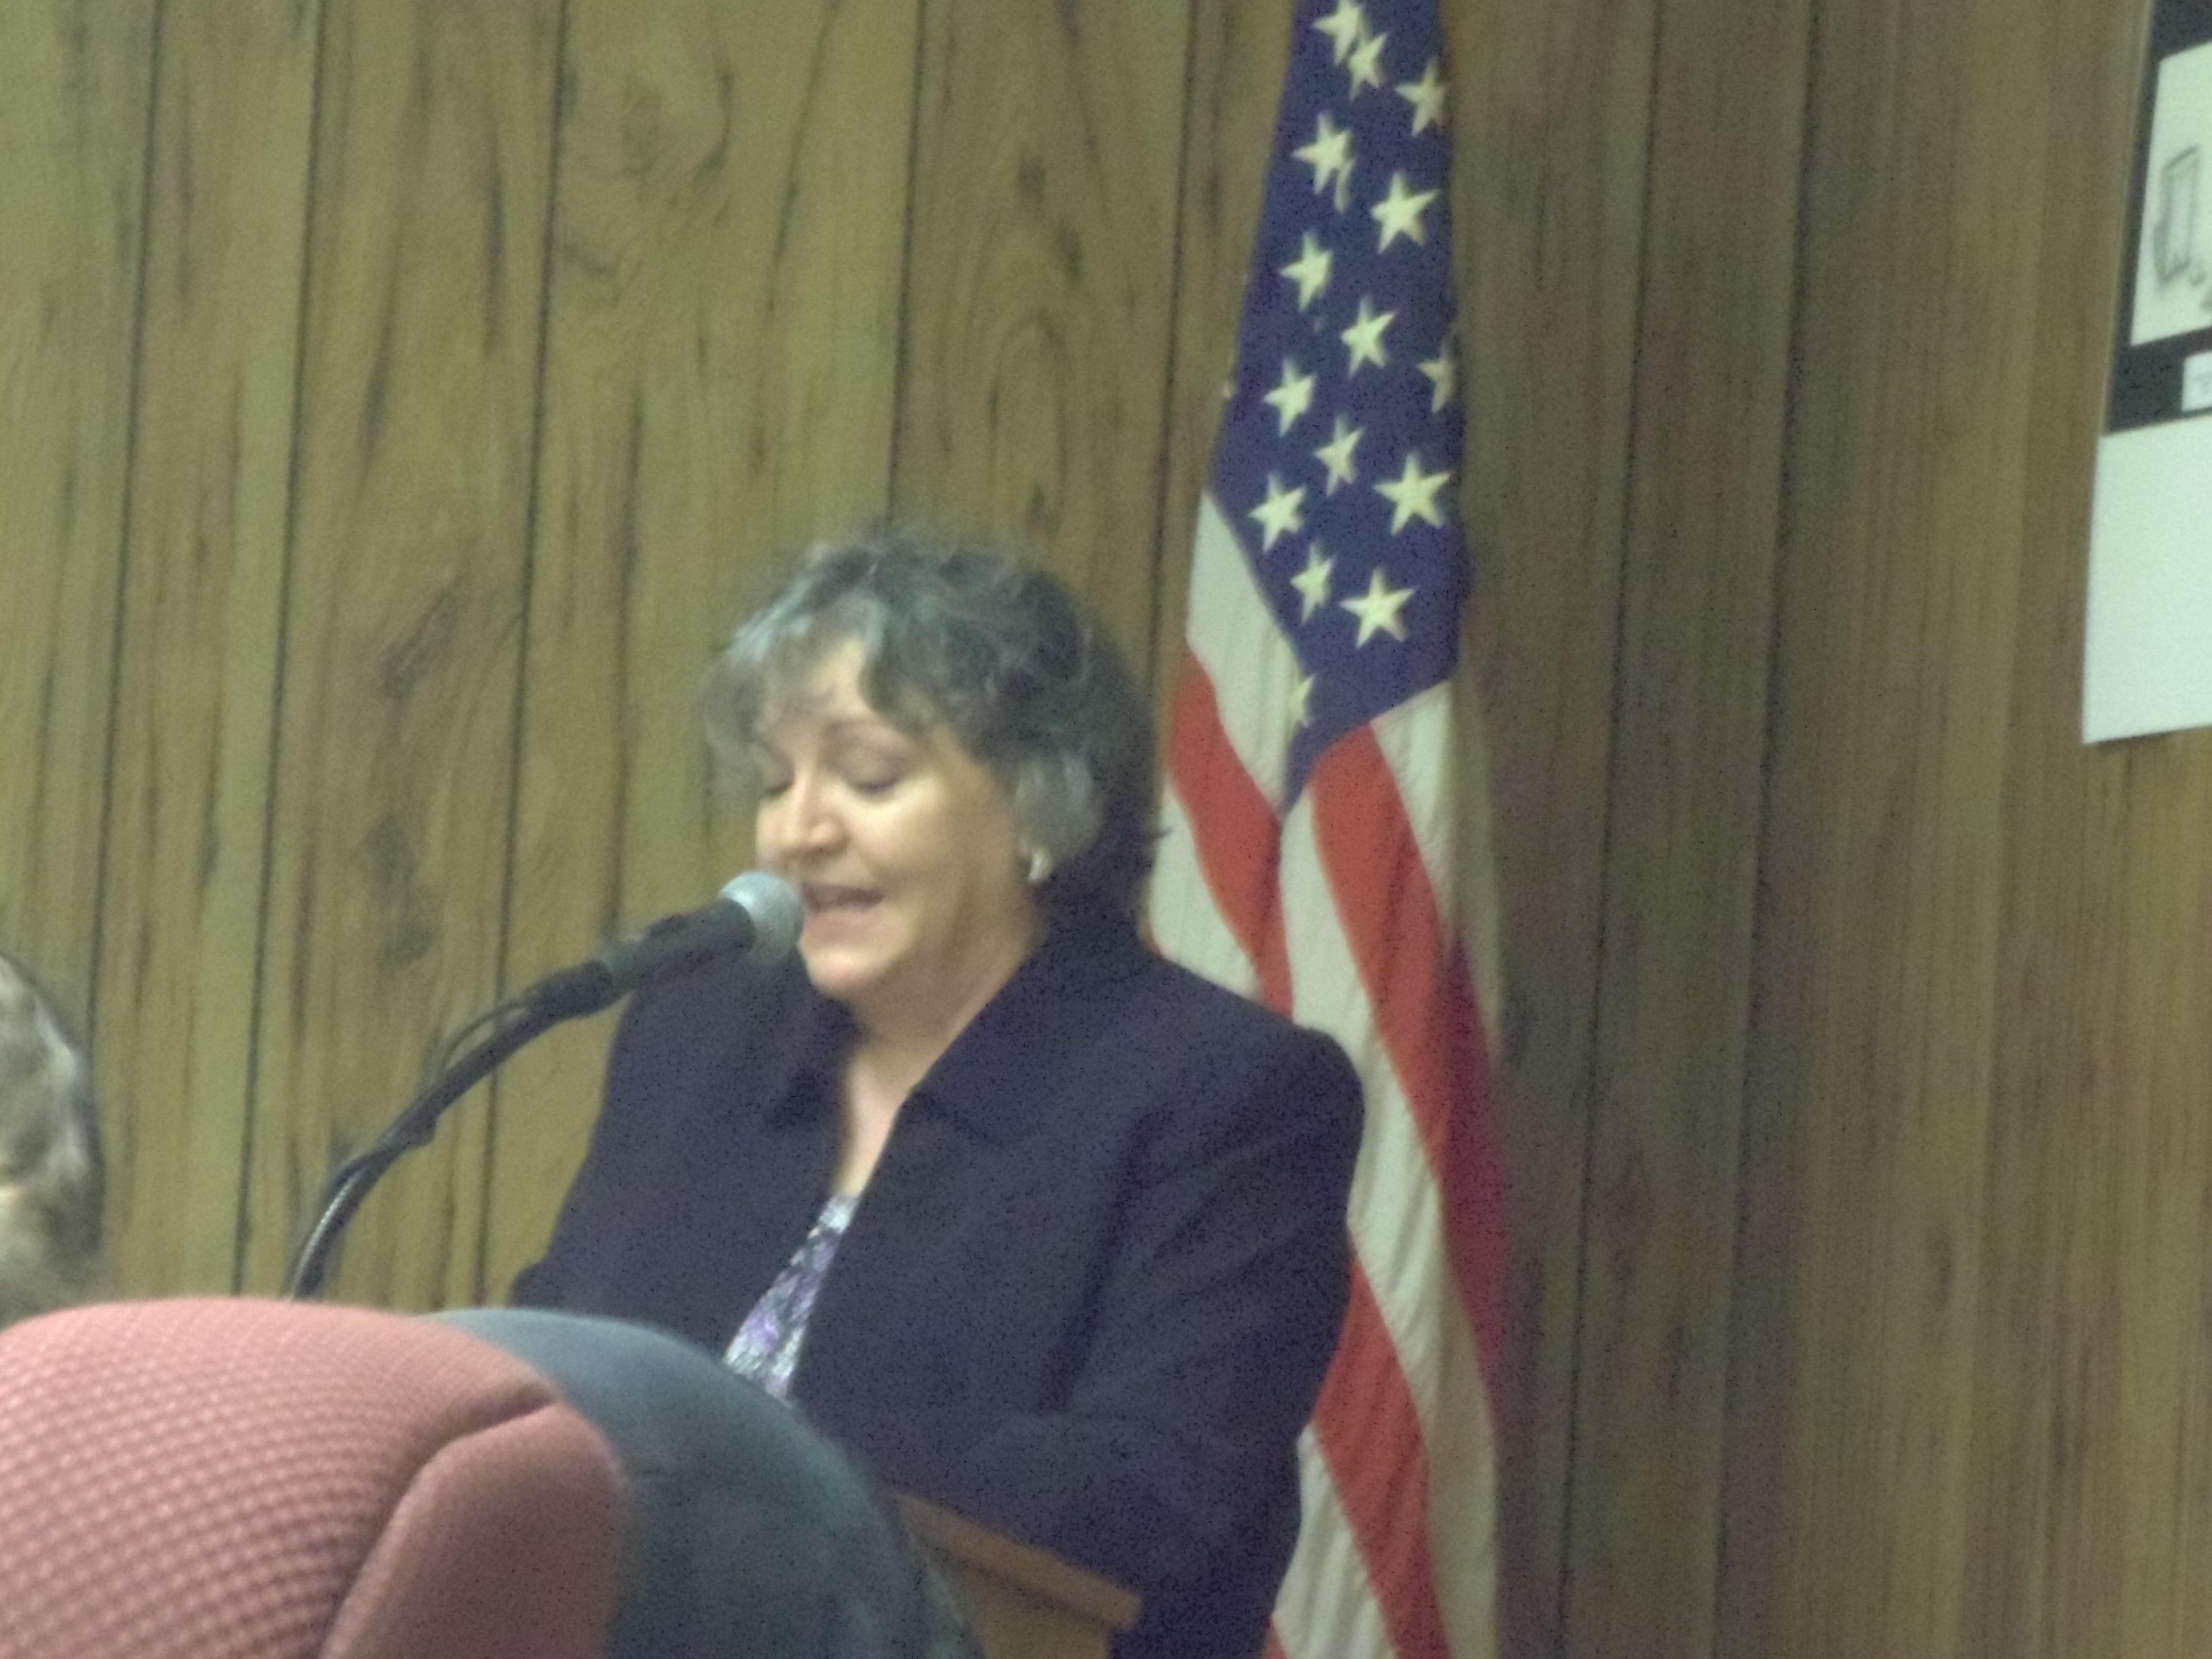 Westfield Nj Genesis Westfield Board Of Ed Discusses